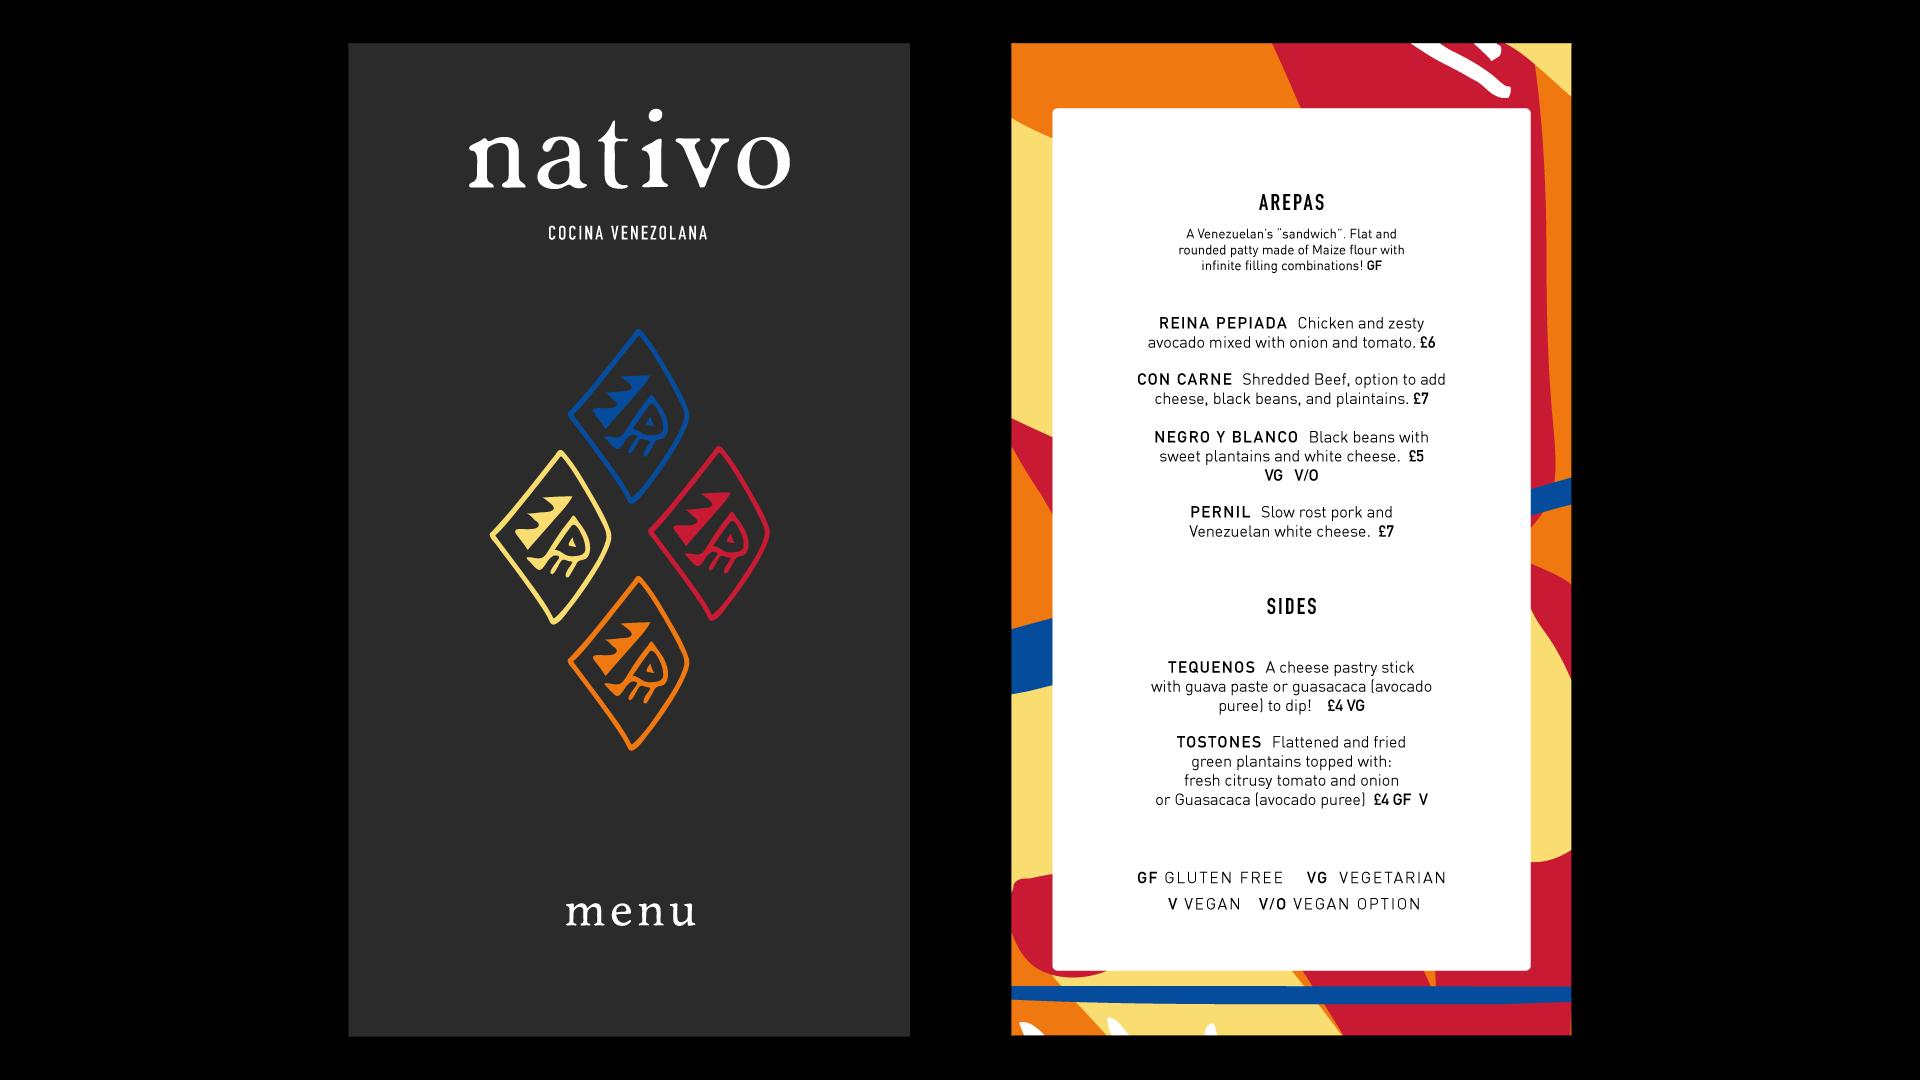 Nativo_menu.png